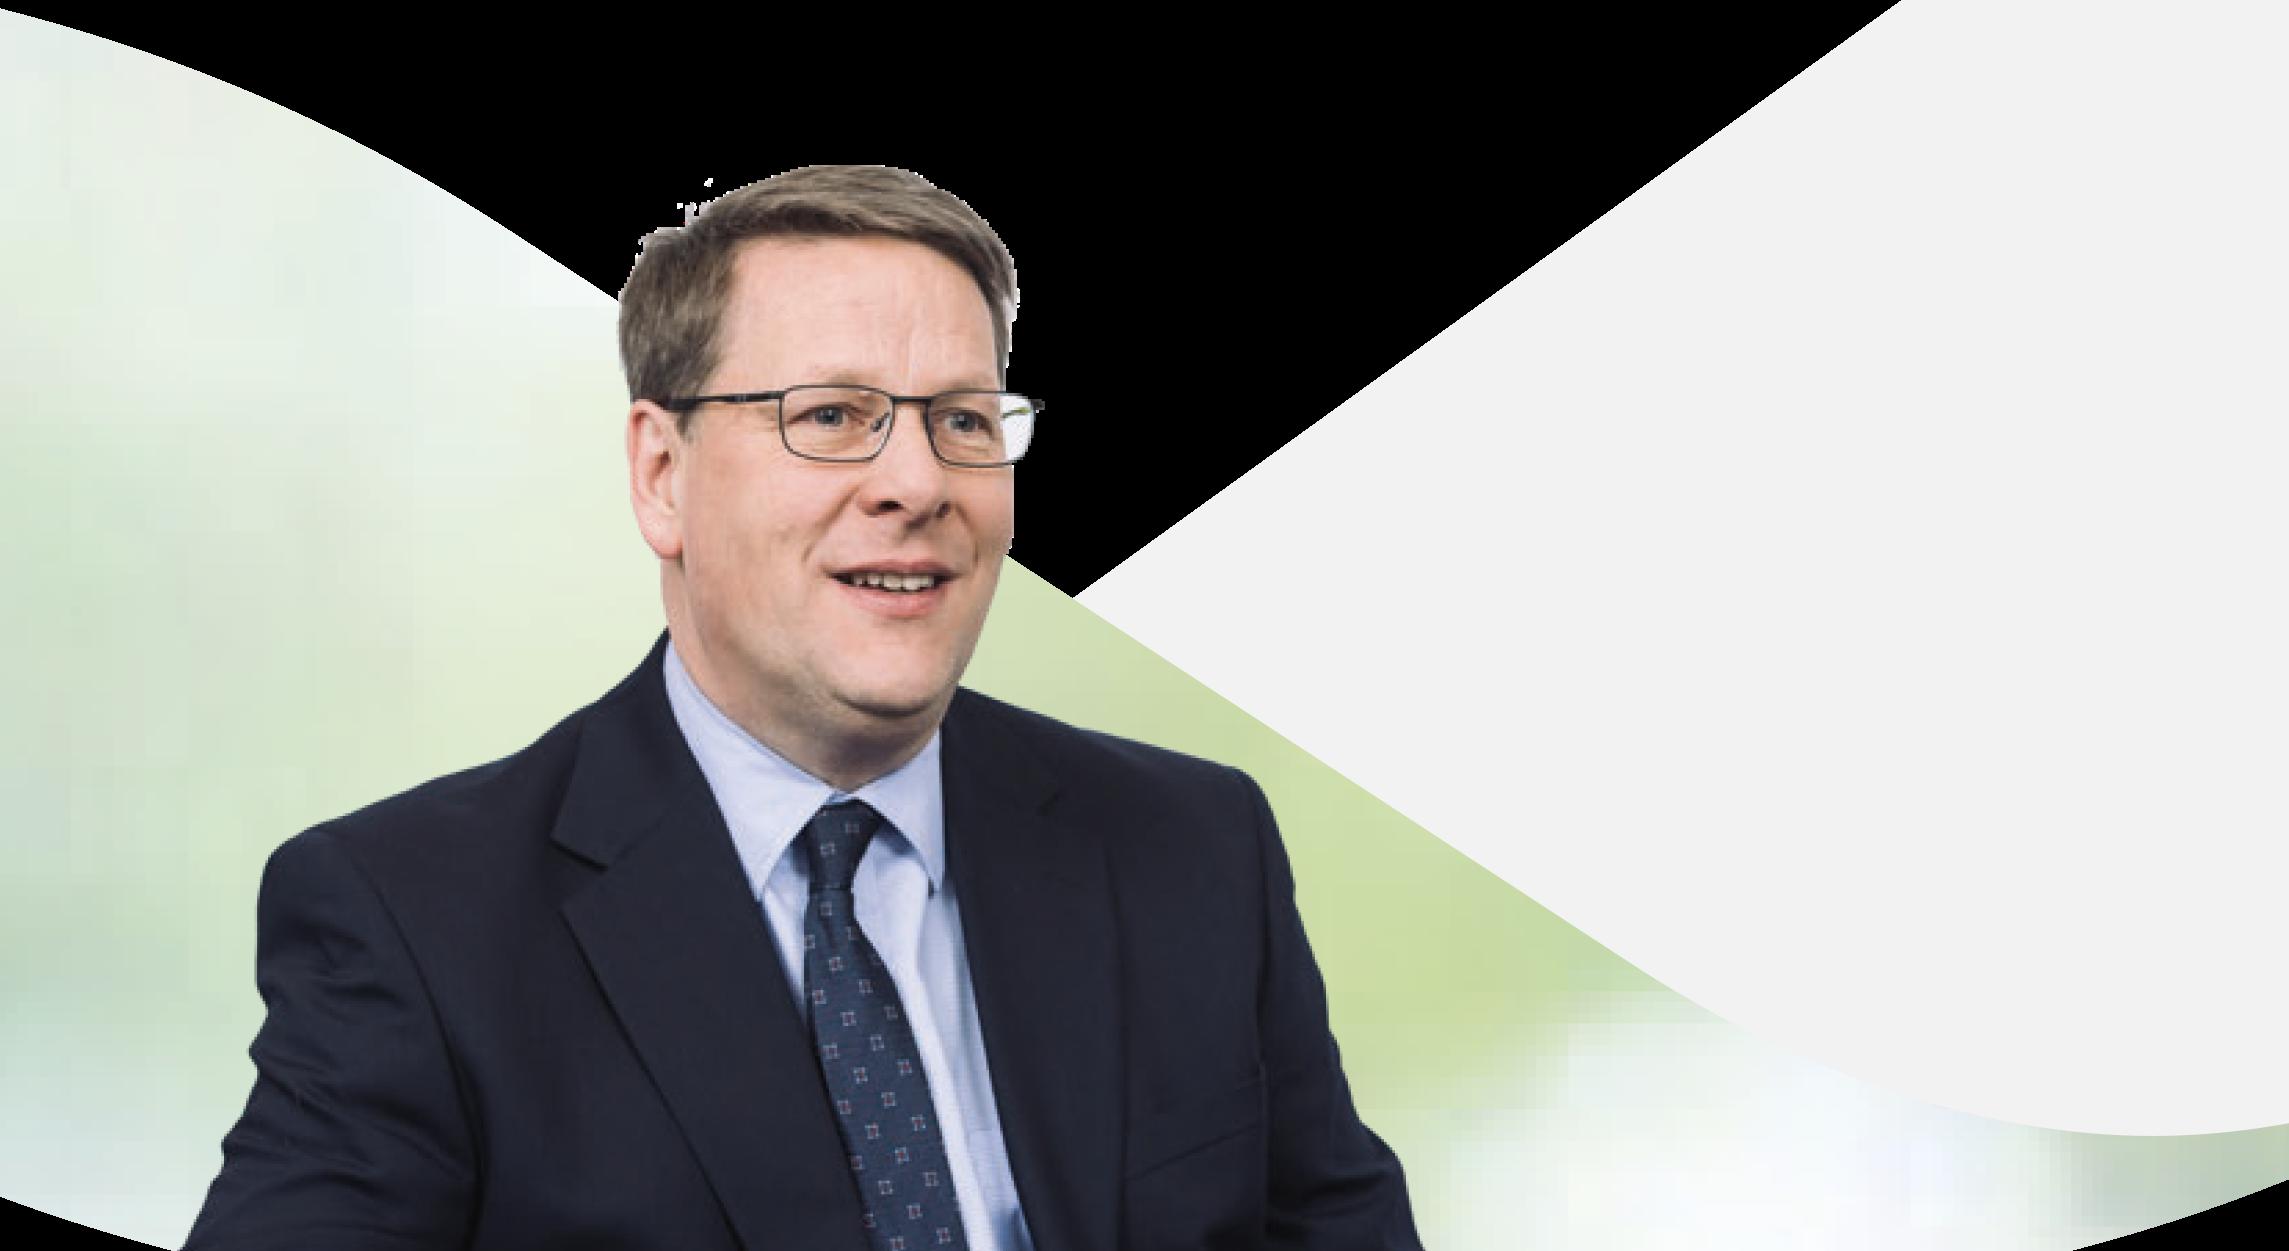 David Miles, CEO Mears Group PLC